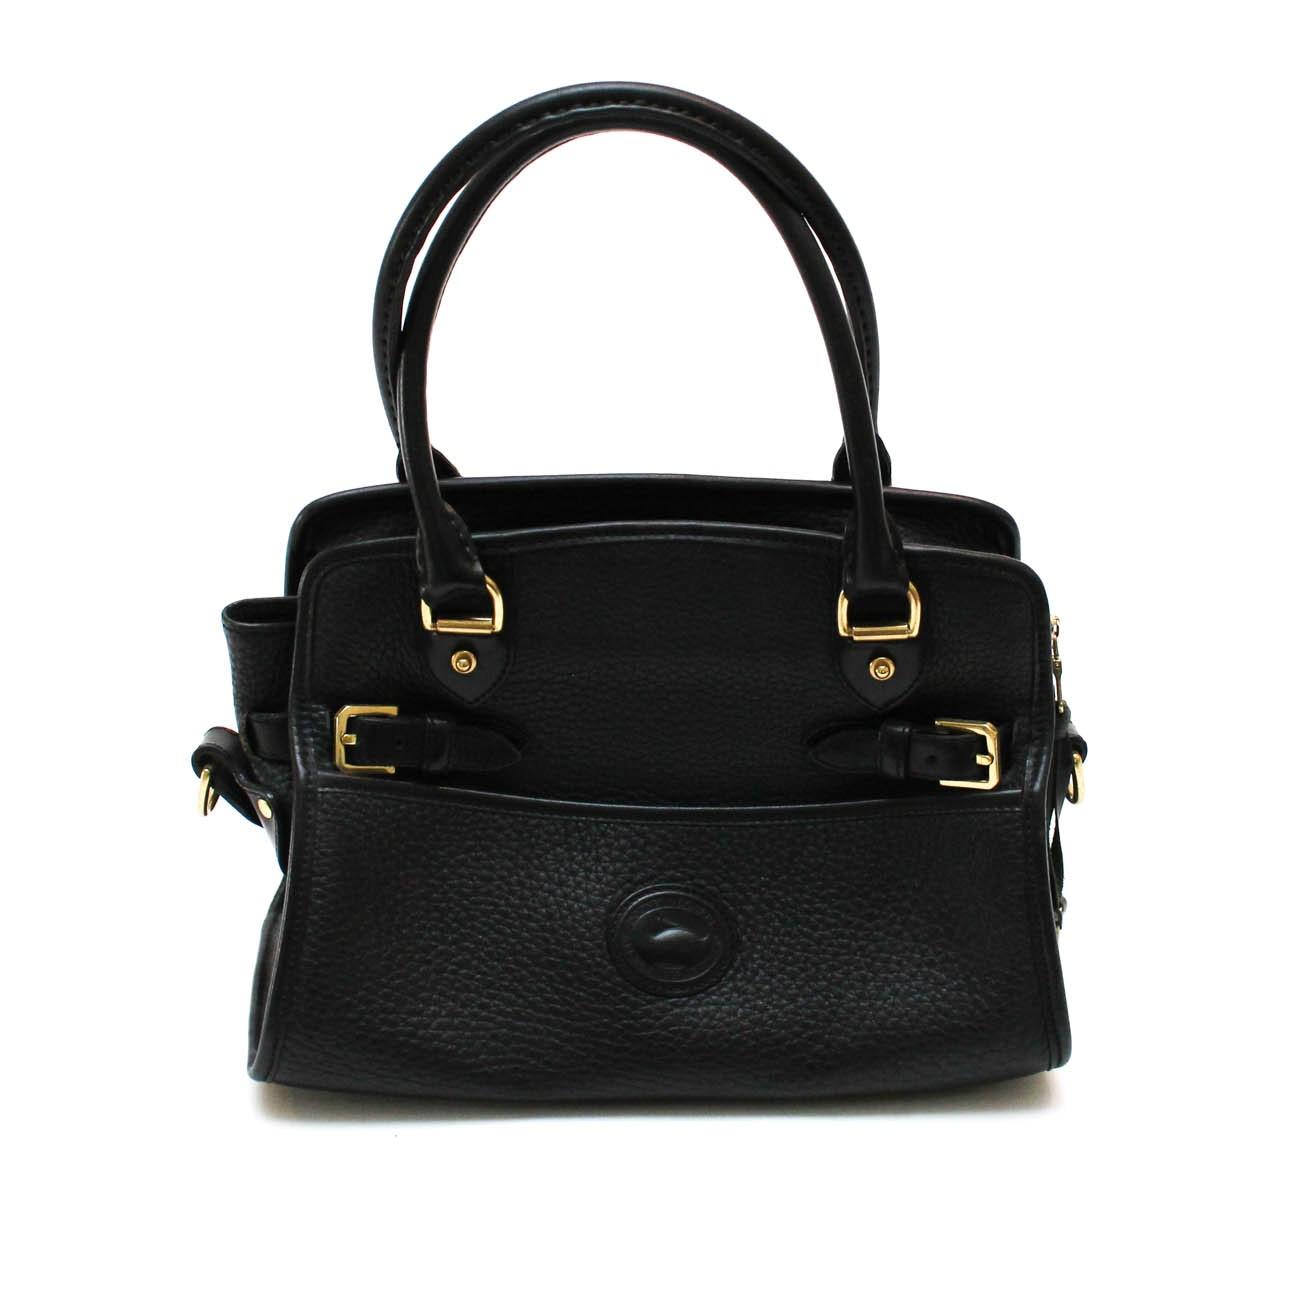 Dooney and Bourke Black Pebble Grain Leather Handbag